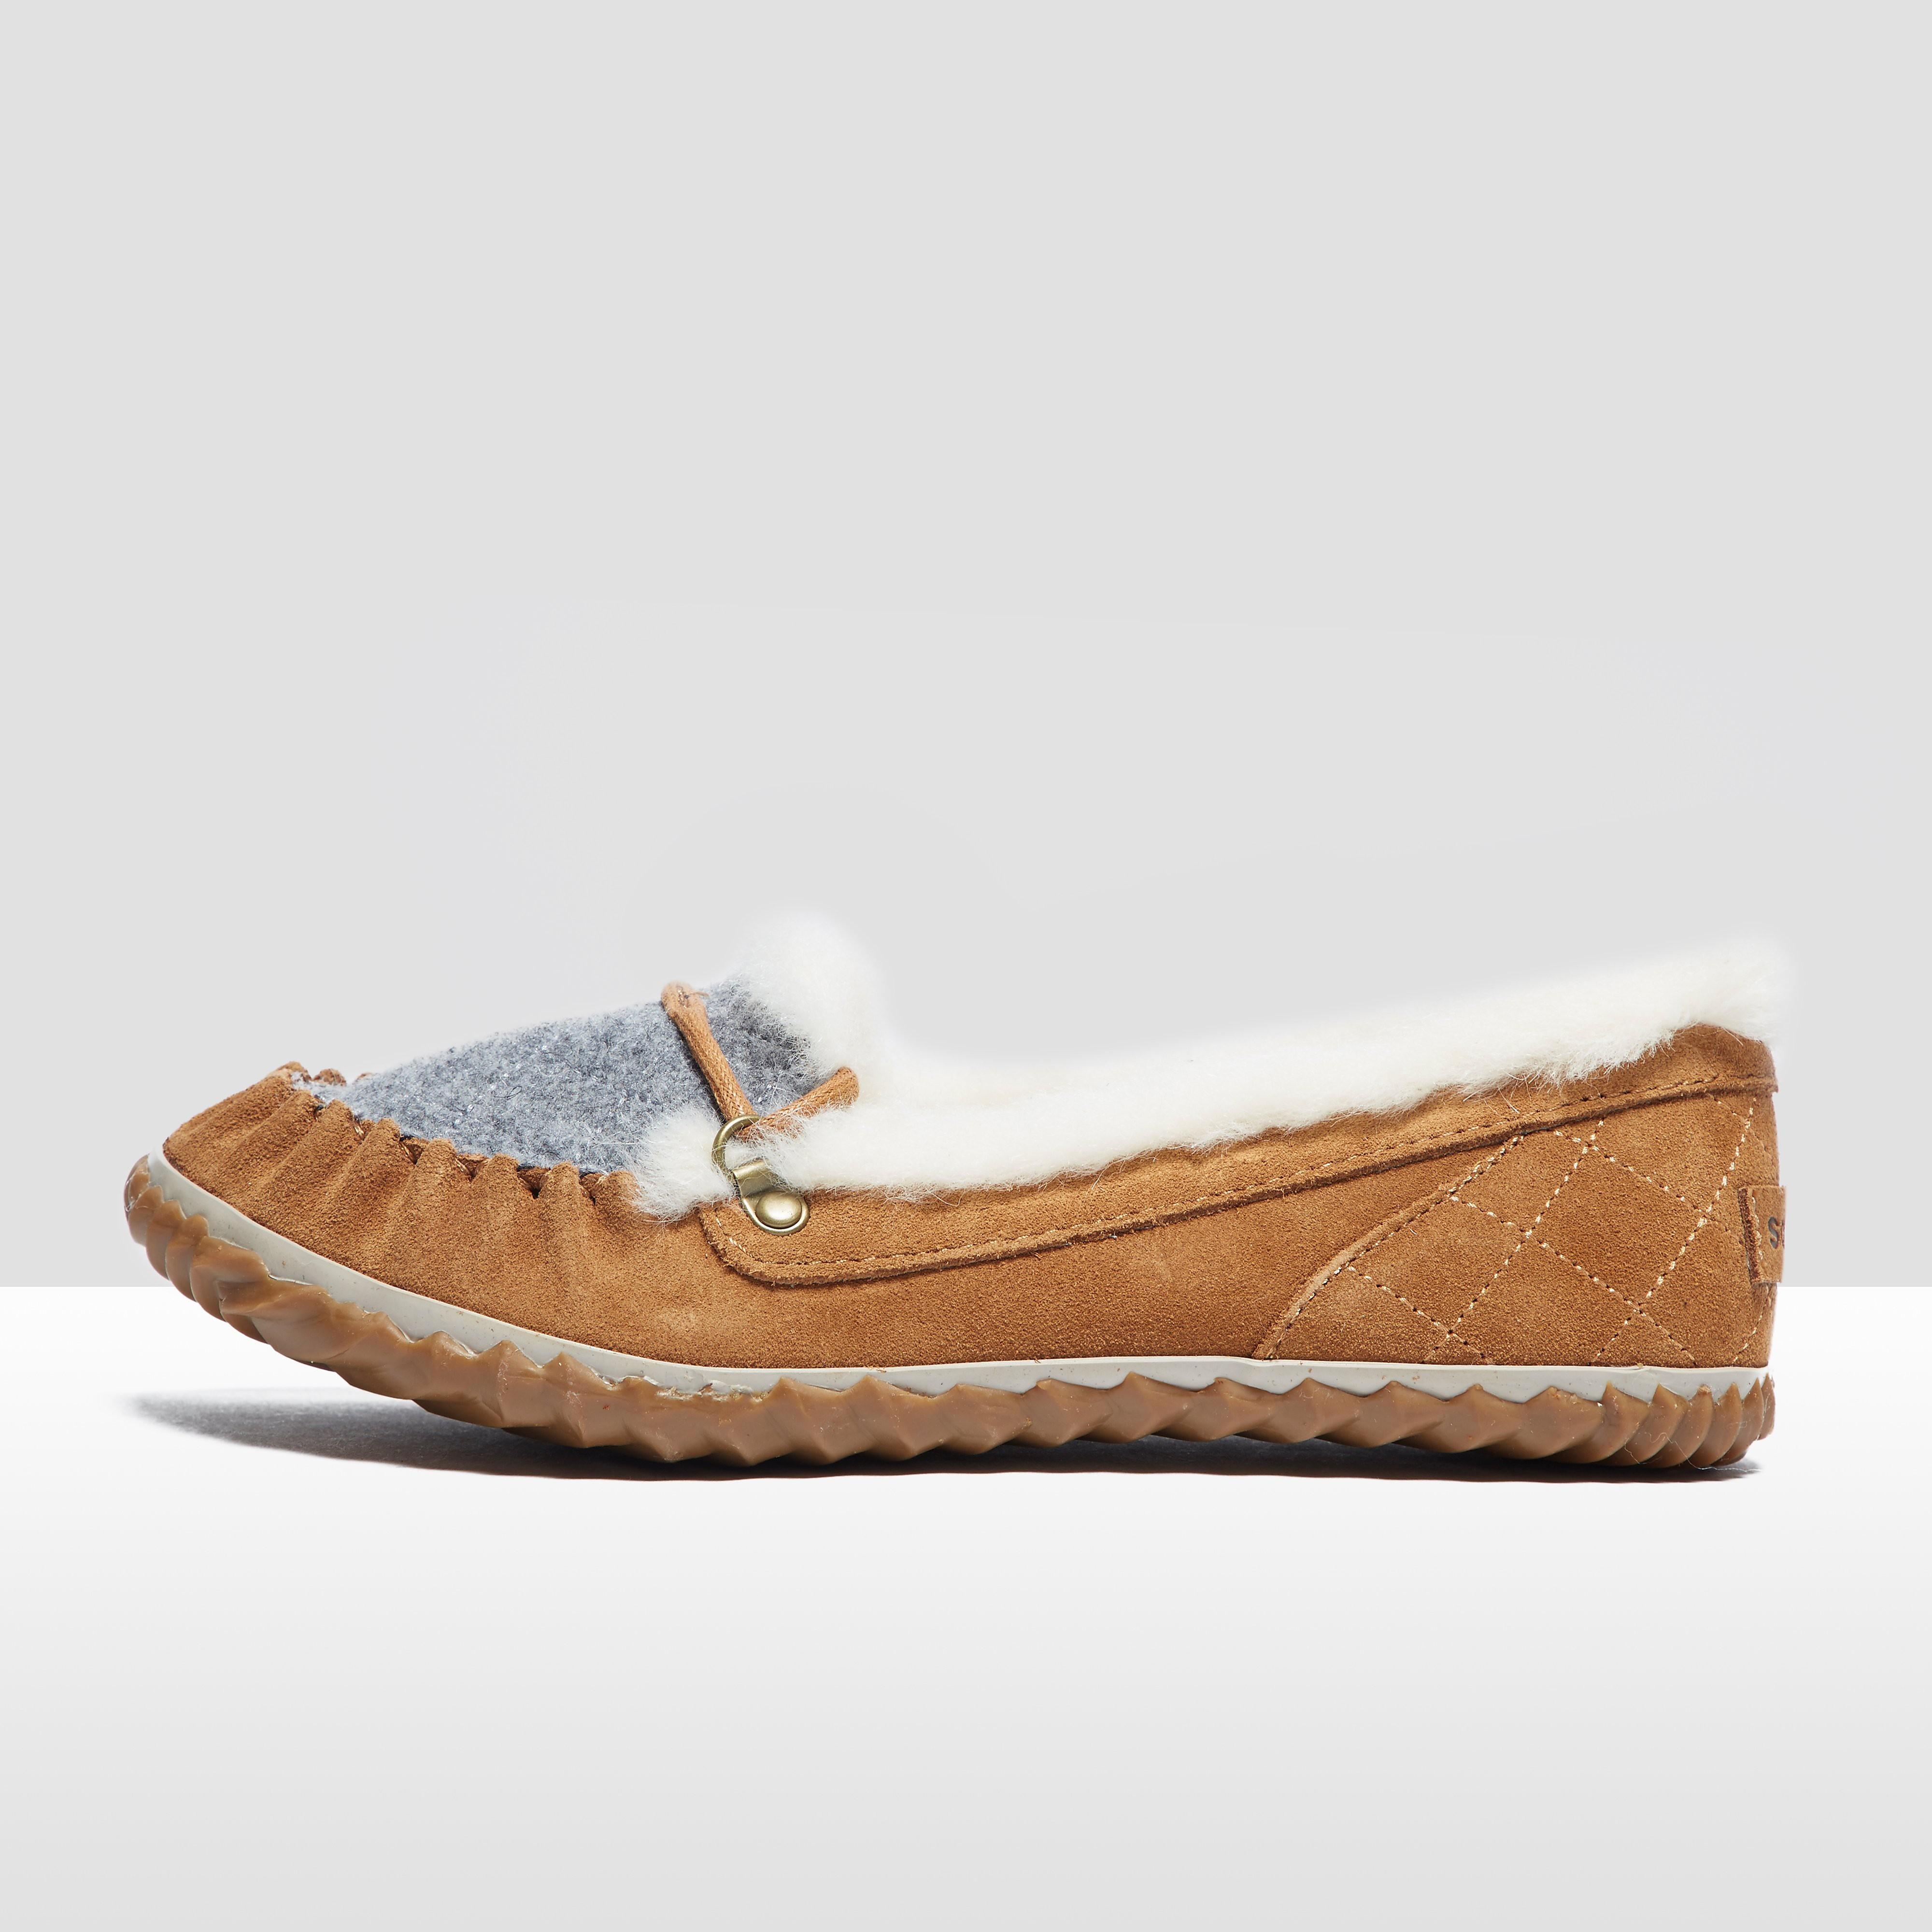 Sorel Out N About Women's Felt Slippers